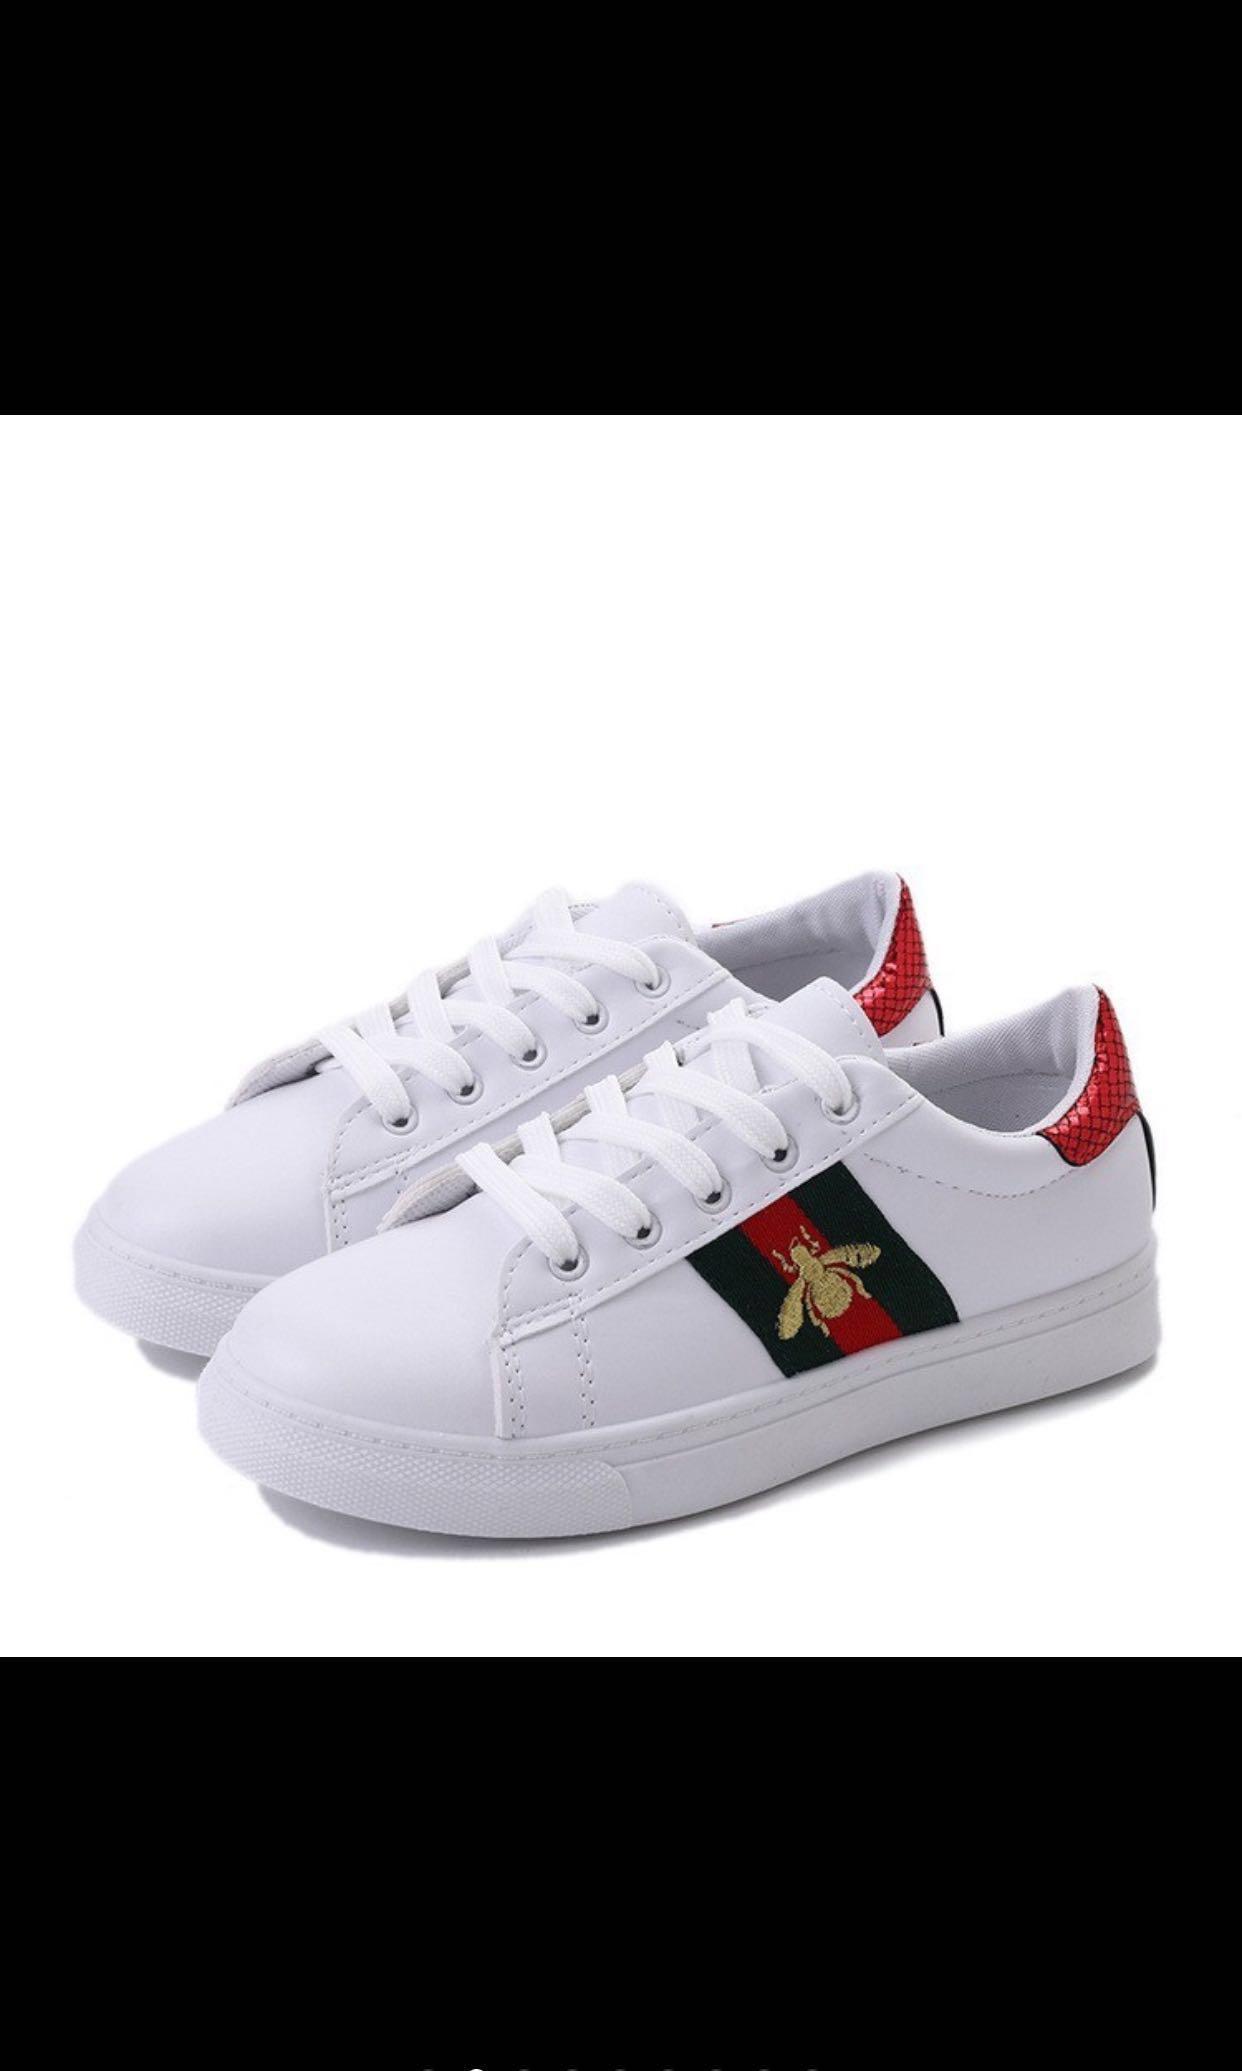 20c5e433ad PO) Korean Fashion White Women Embroidery Casual Sneakers Shoes ...